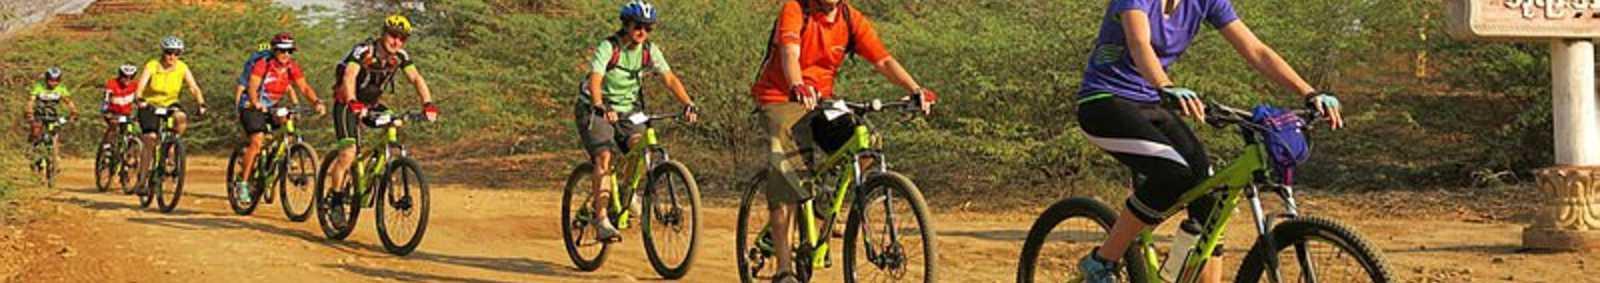 cycling in Bagan